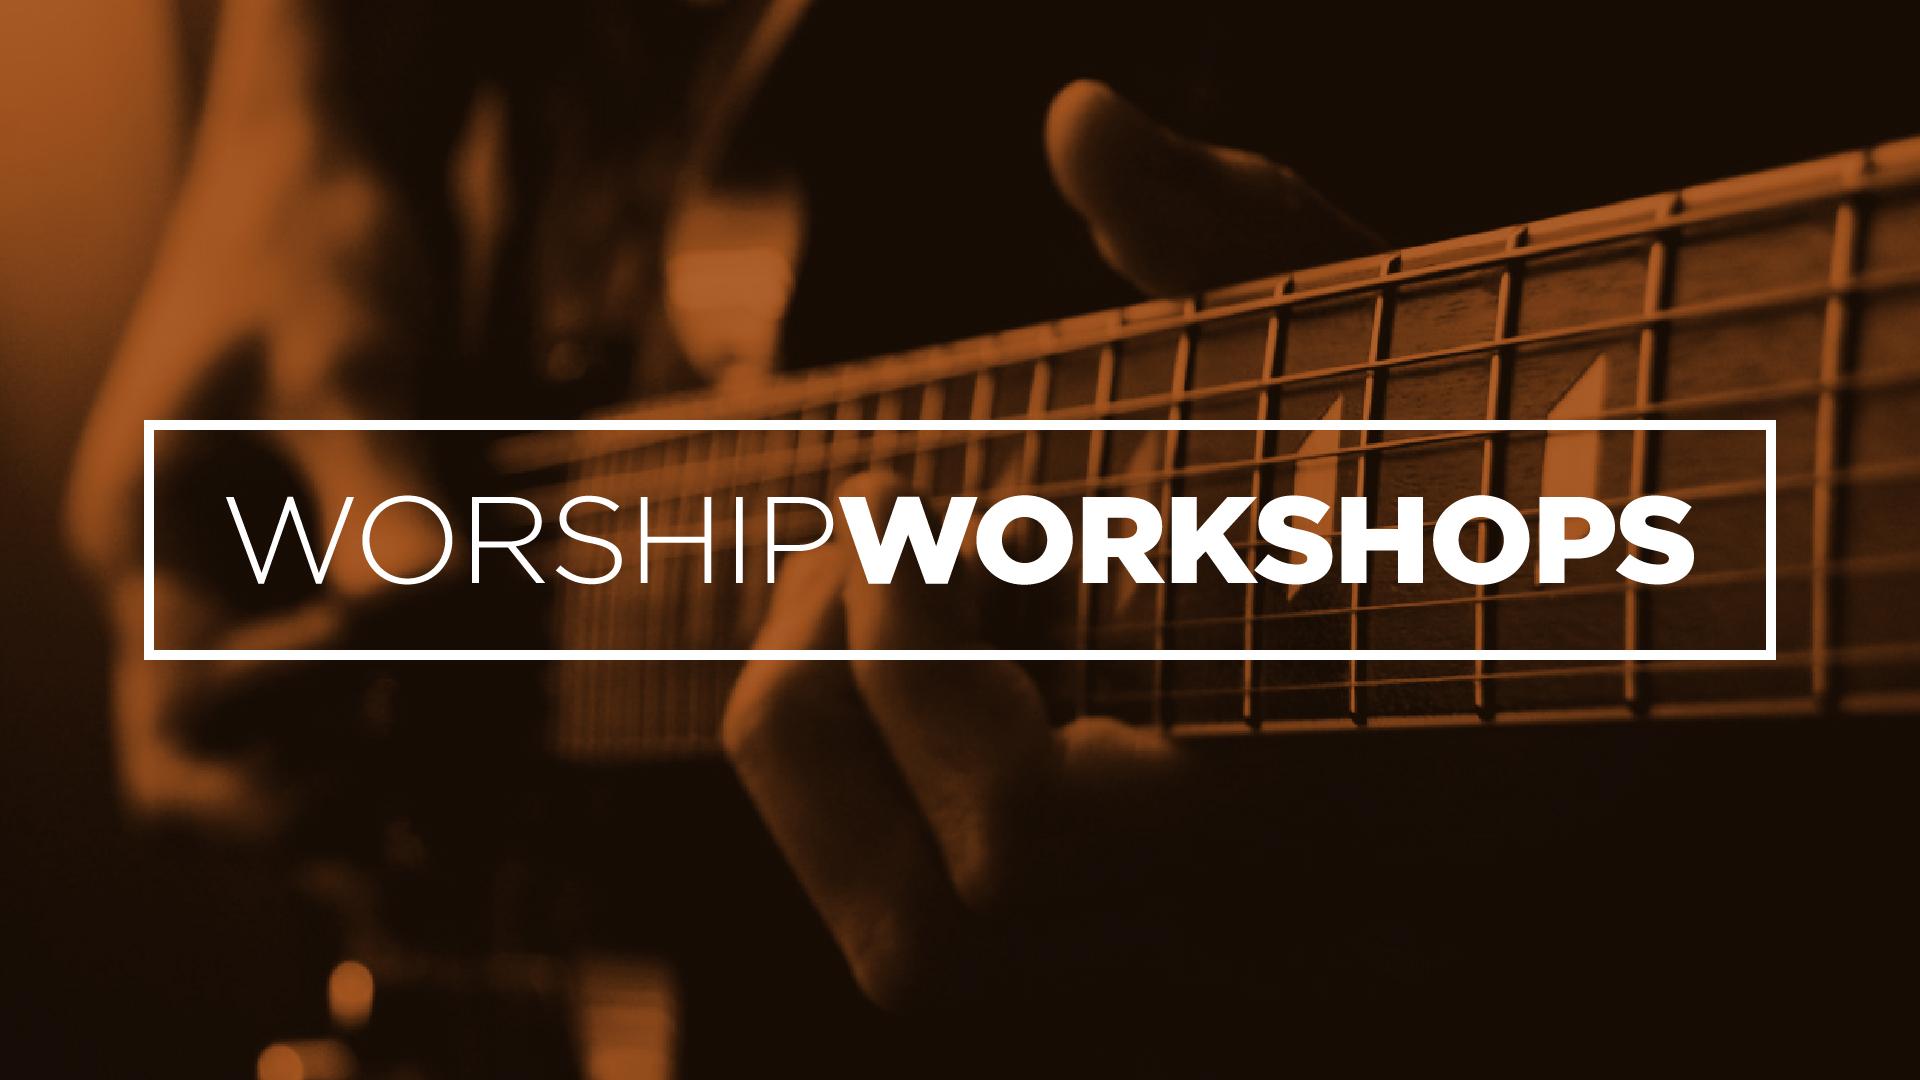 Worship Workshops logo